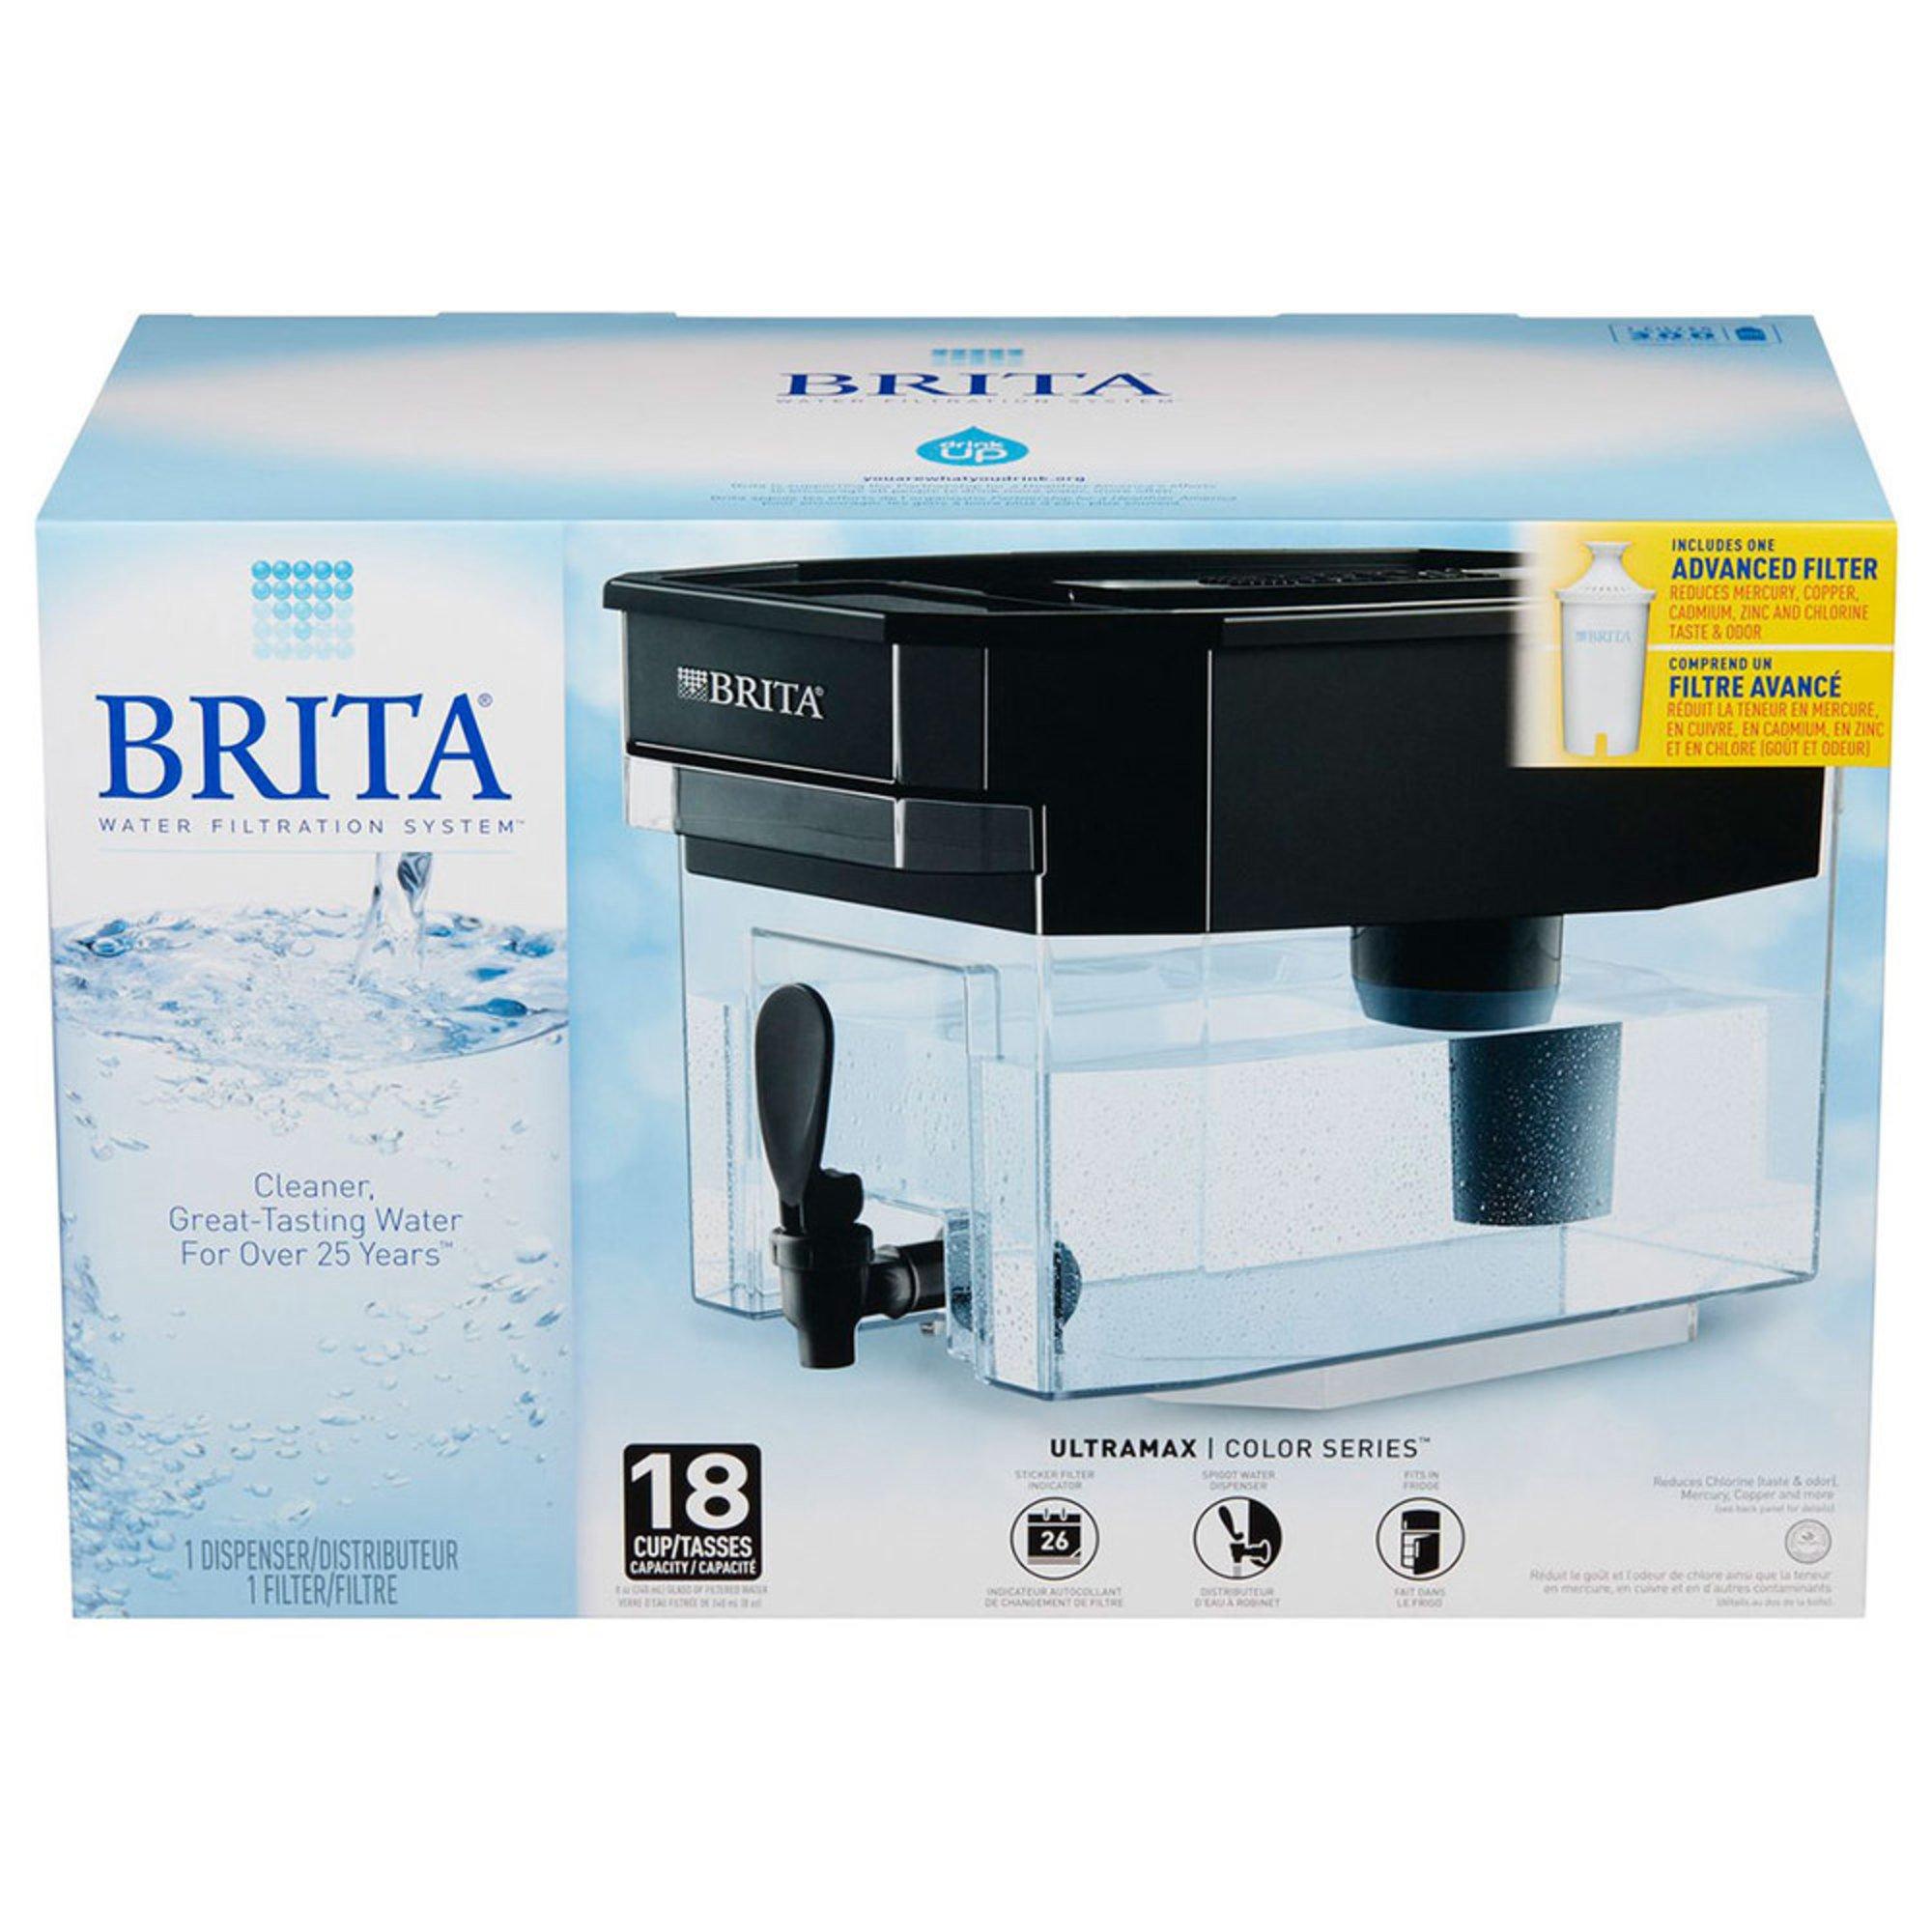 Brita 18-cup Ultramax Water Filter Dispenser, Black (36039)   Water ...